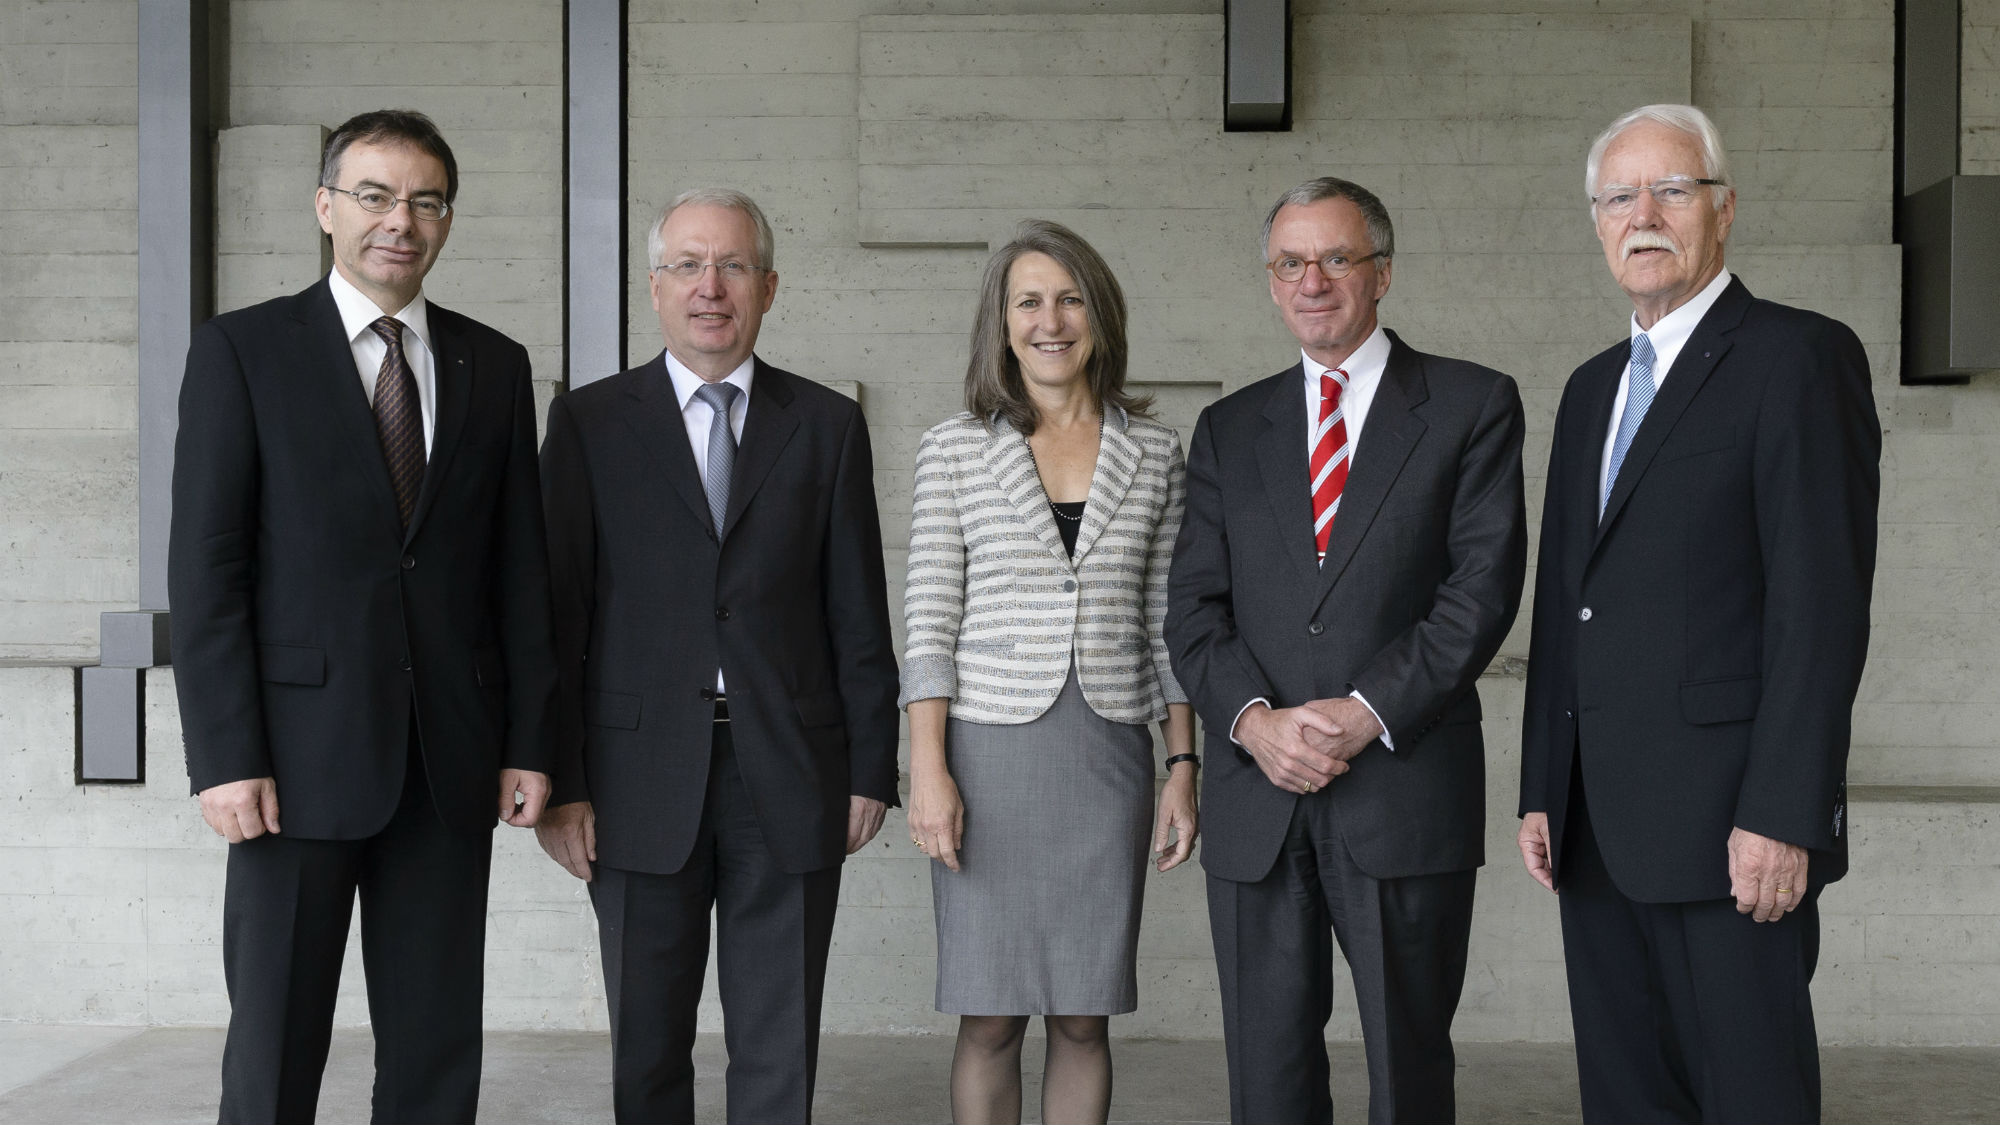 Honorary Doctor of Economics 2013 Prof. Dr. Günther Gebhardt